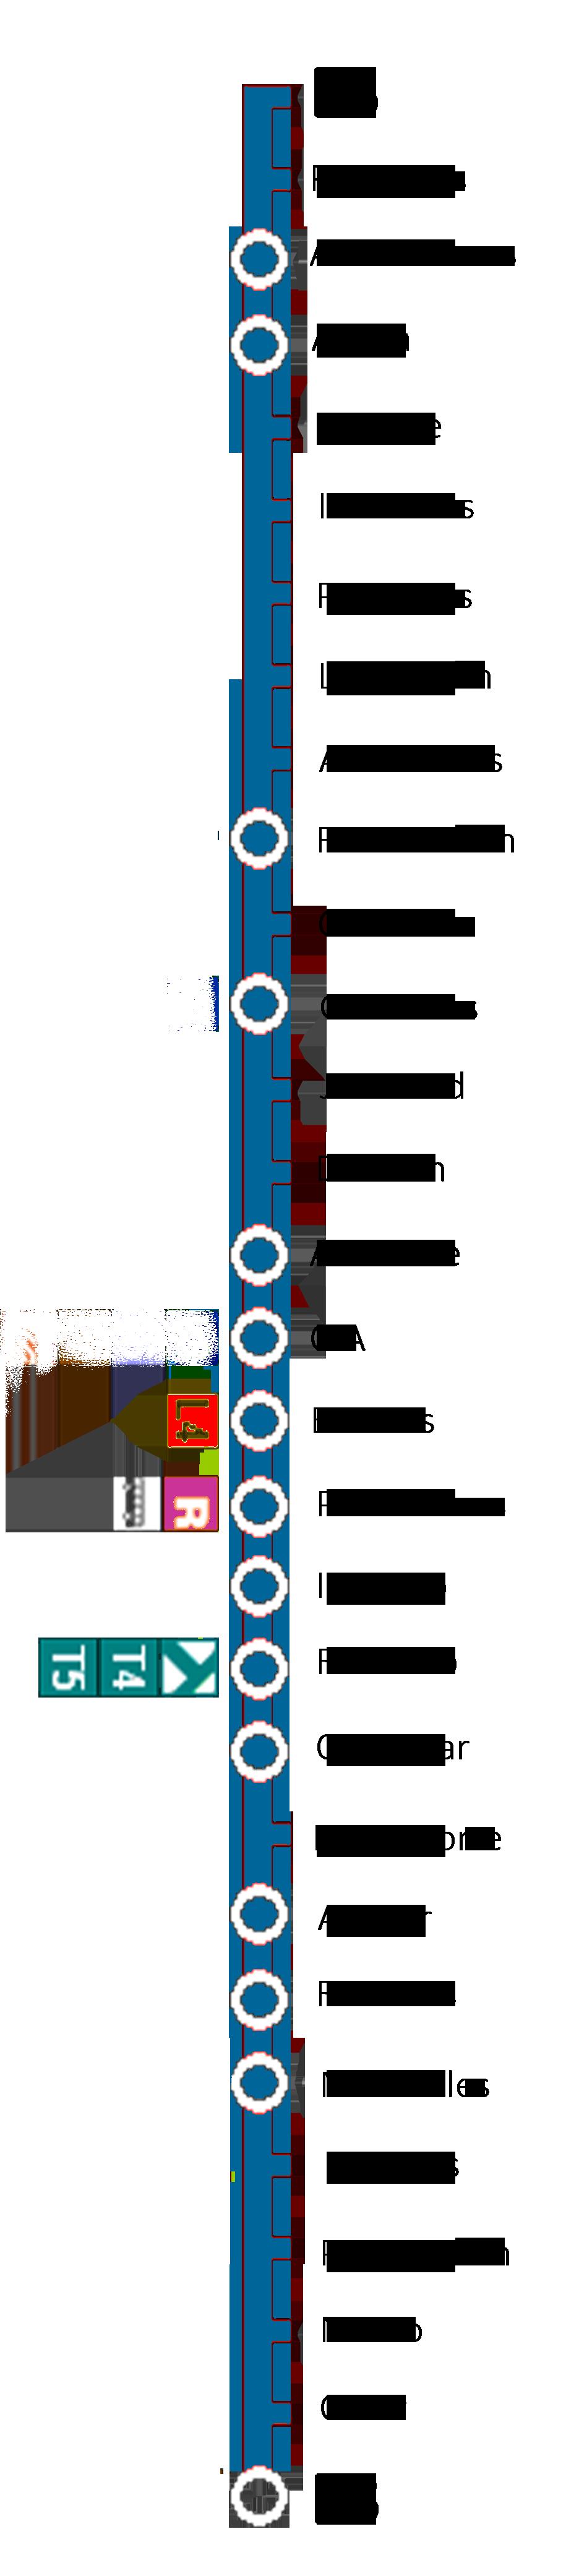 Linea3_lateral_web